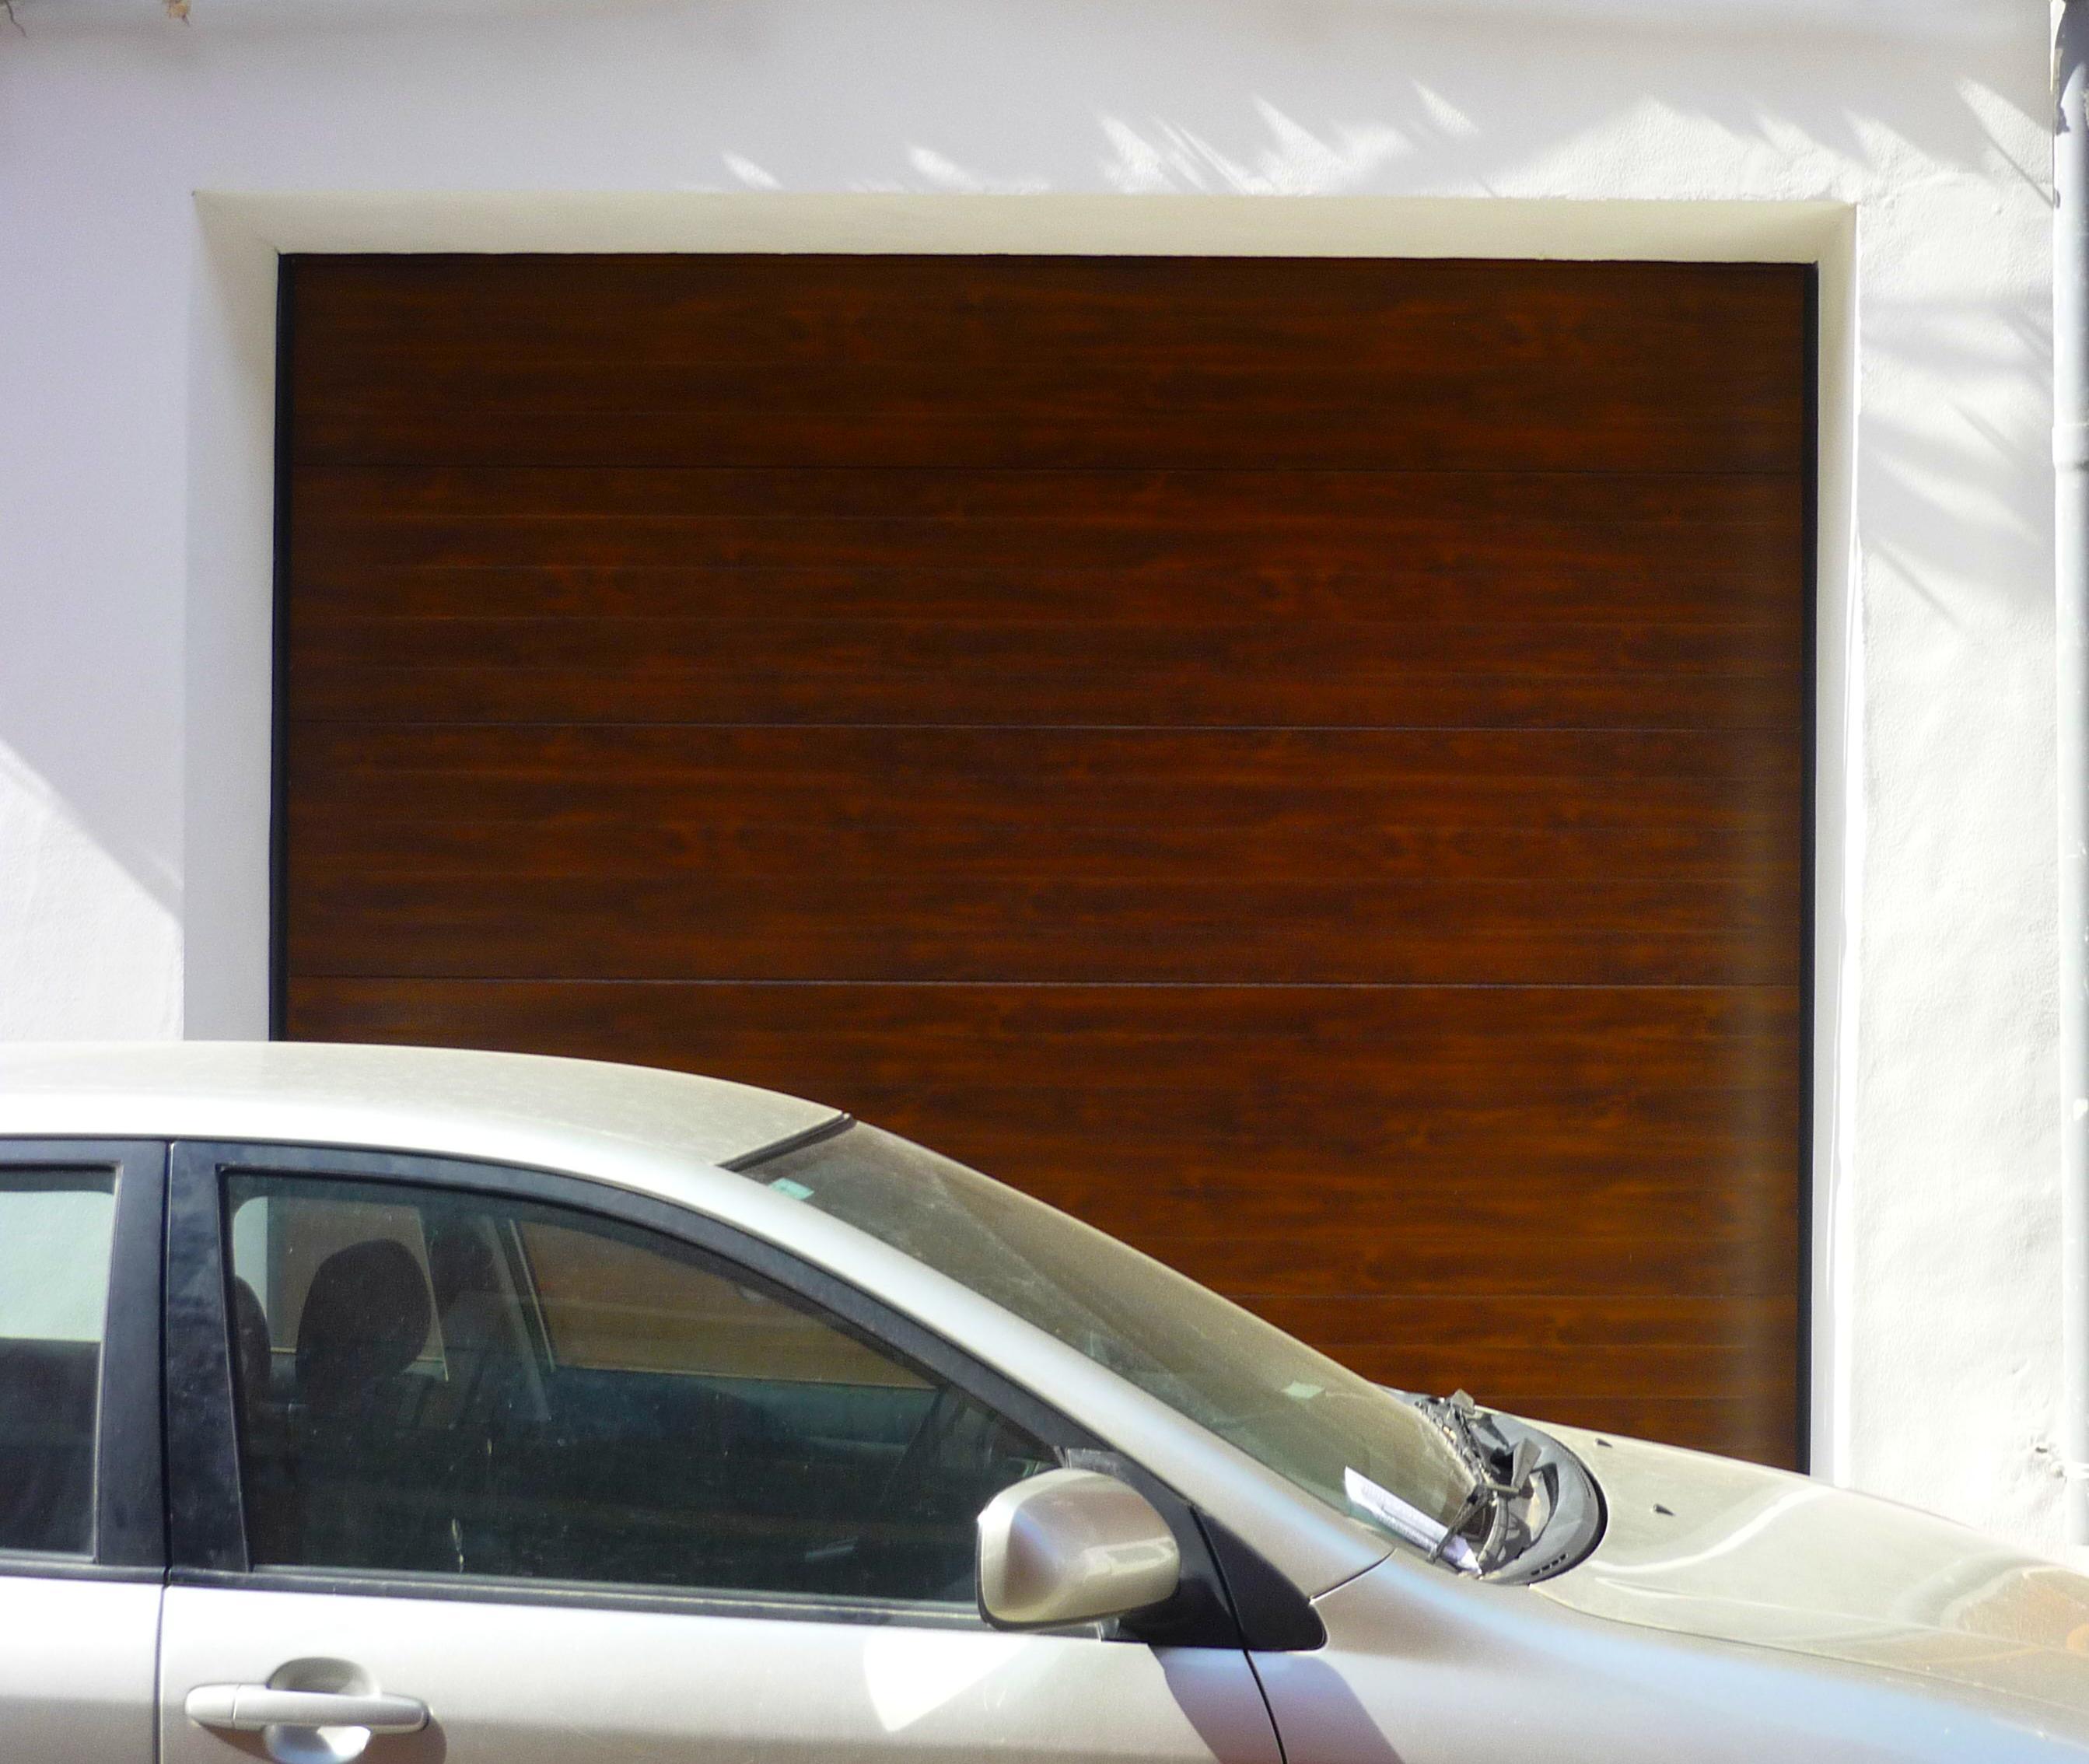 Puerta seccional imitacion madera en calle Pare Pere (Denia)